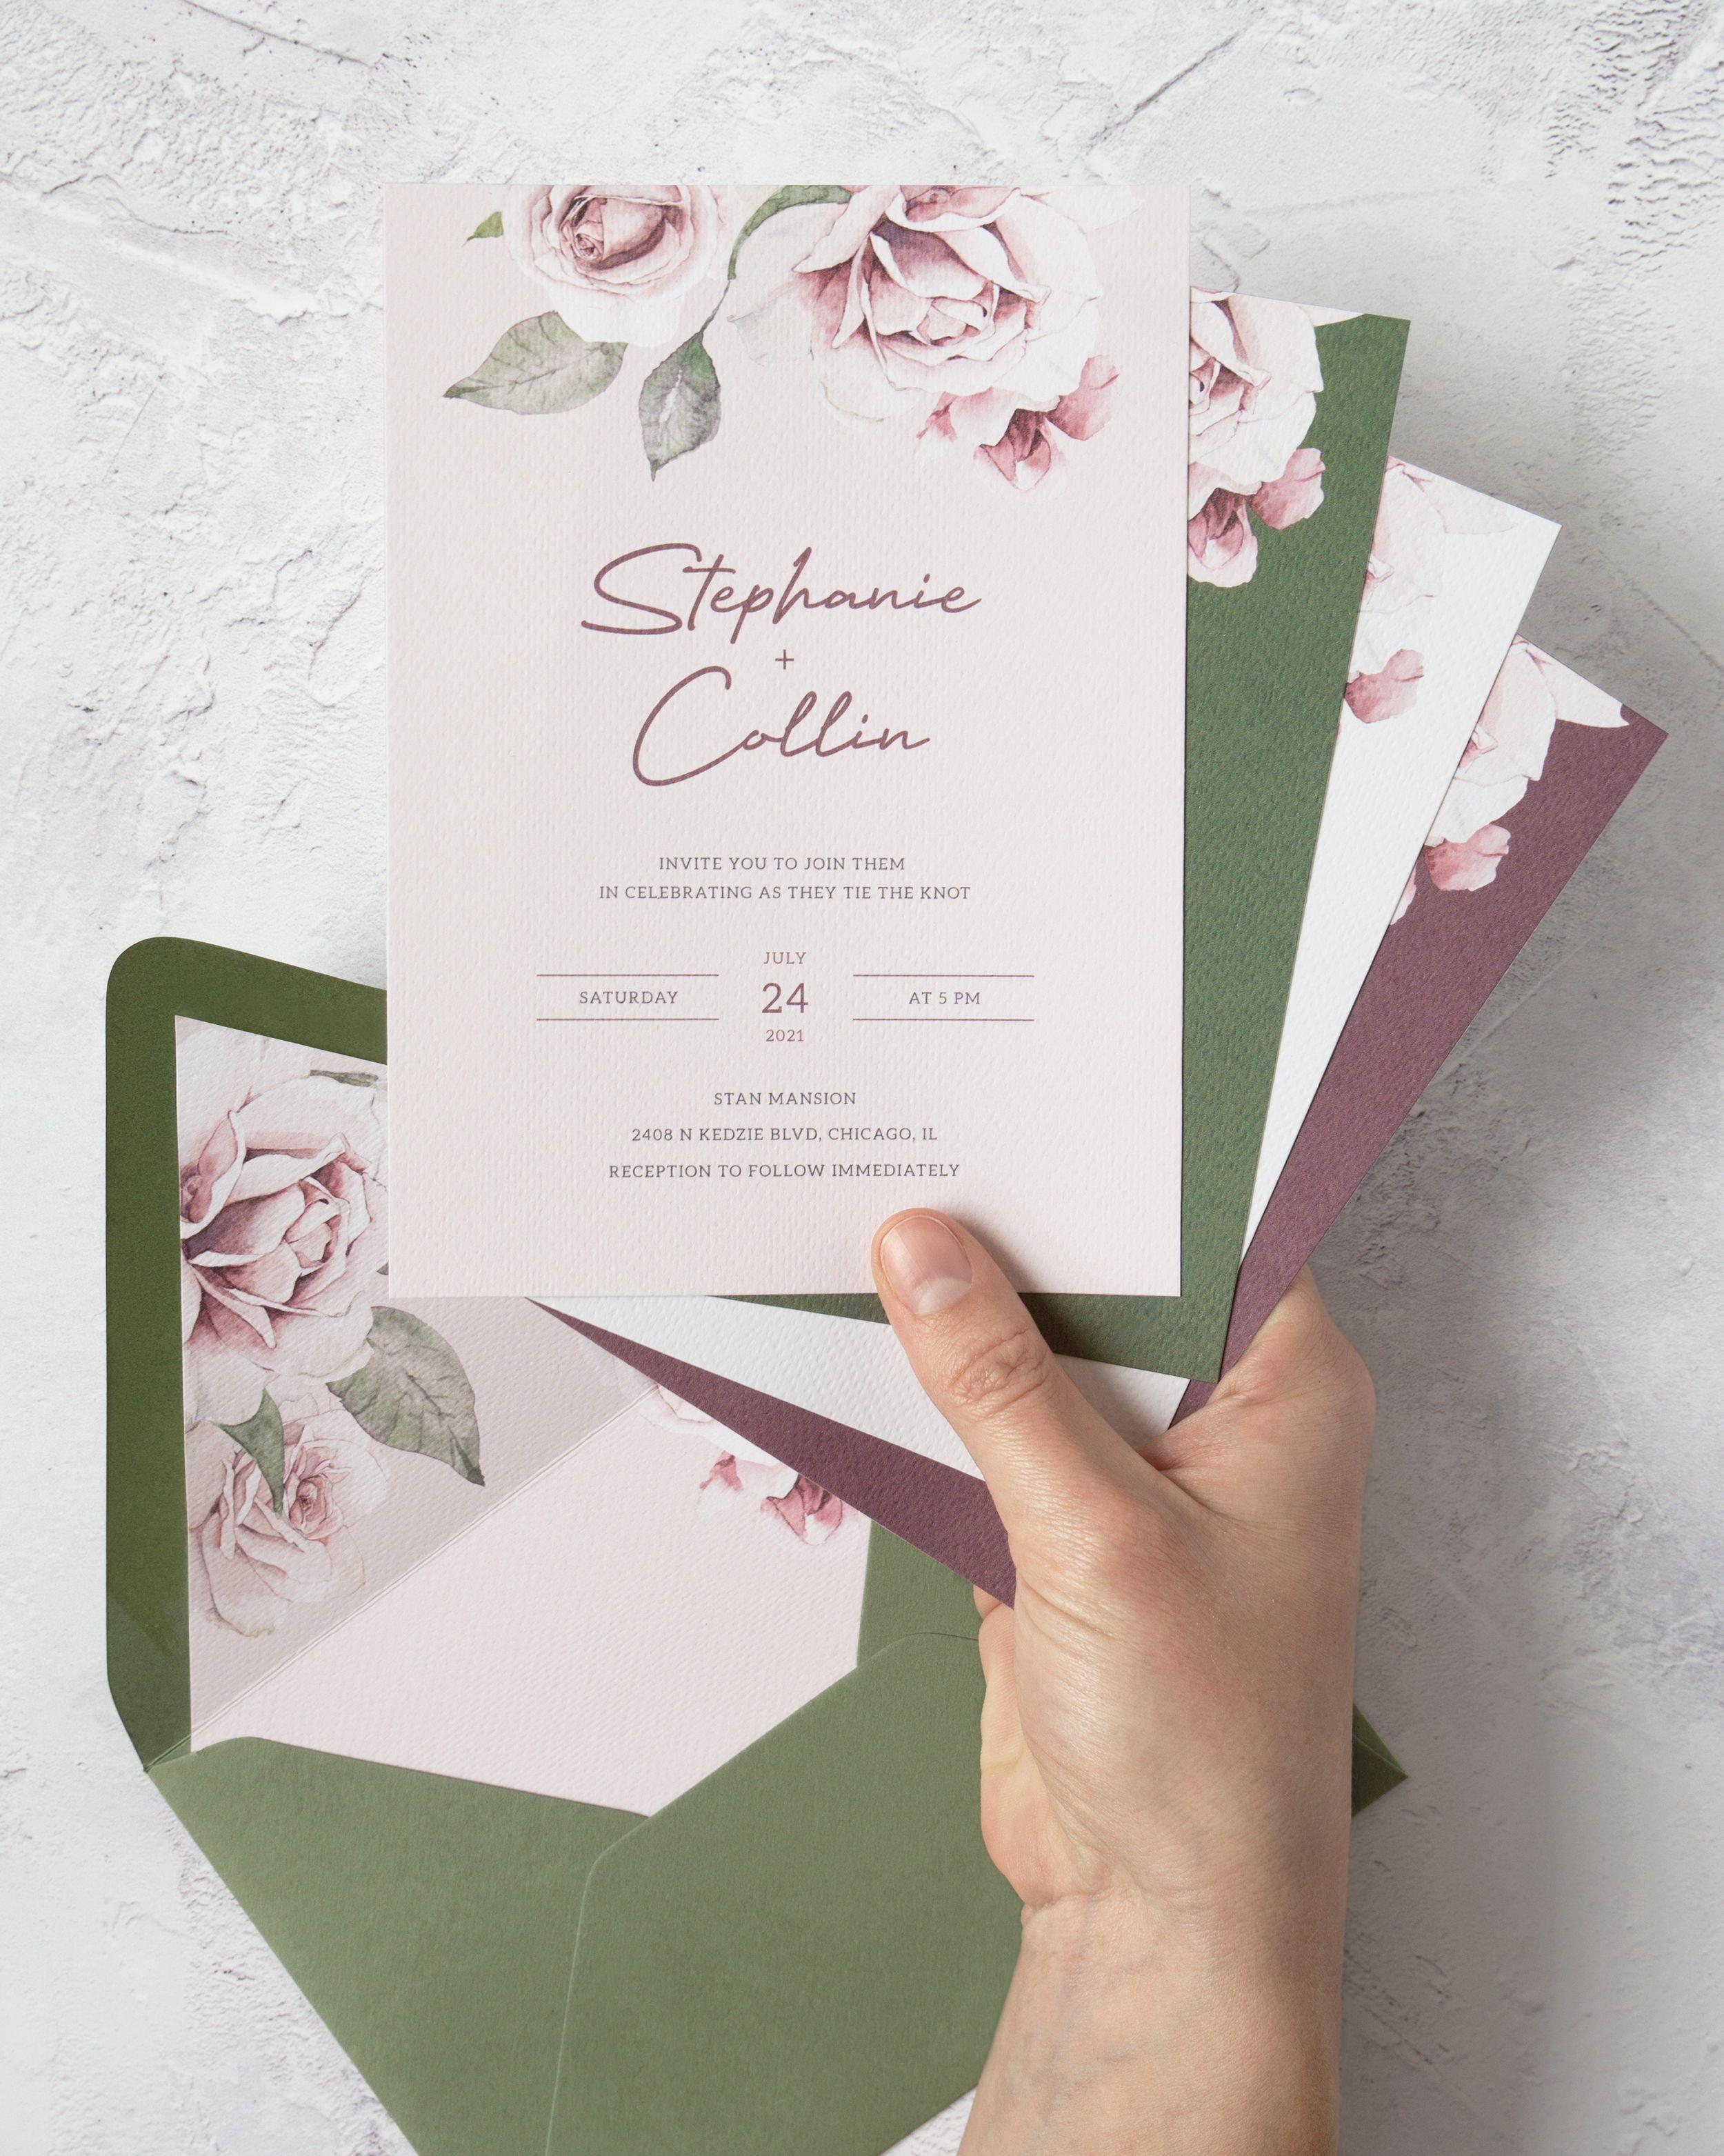 Dusty Rose Wedding Invitation Template Printable Pink Floral Etsy In 2020 Floral Wedding Invitation Card Fun Wedding Invitations Rose Wedding Invitations